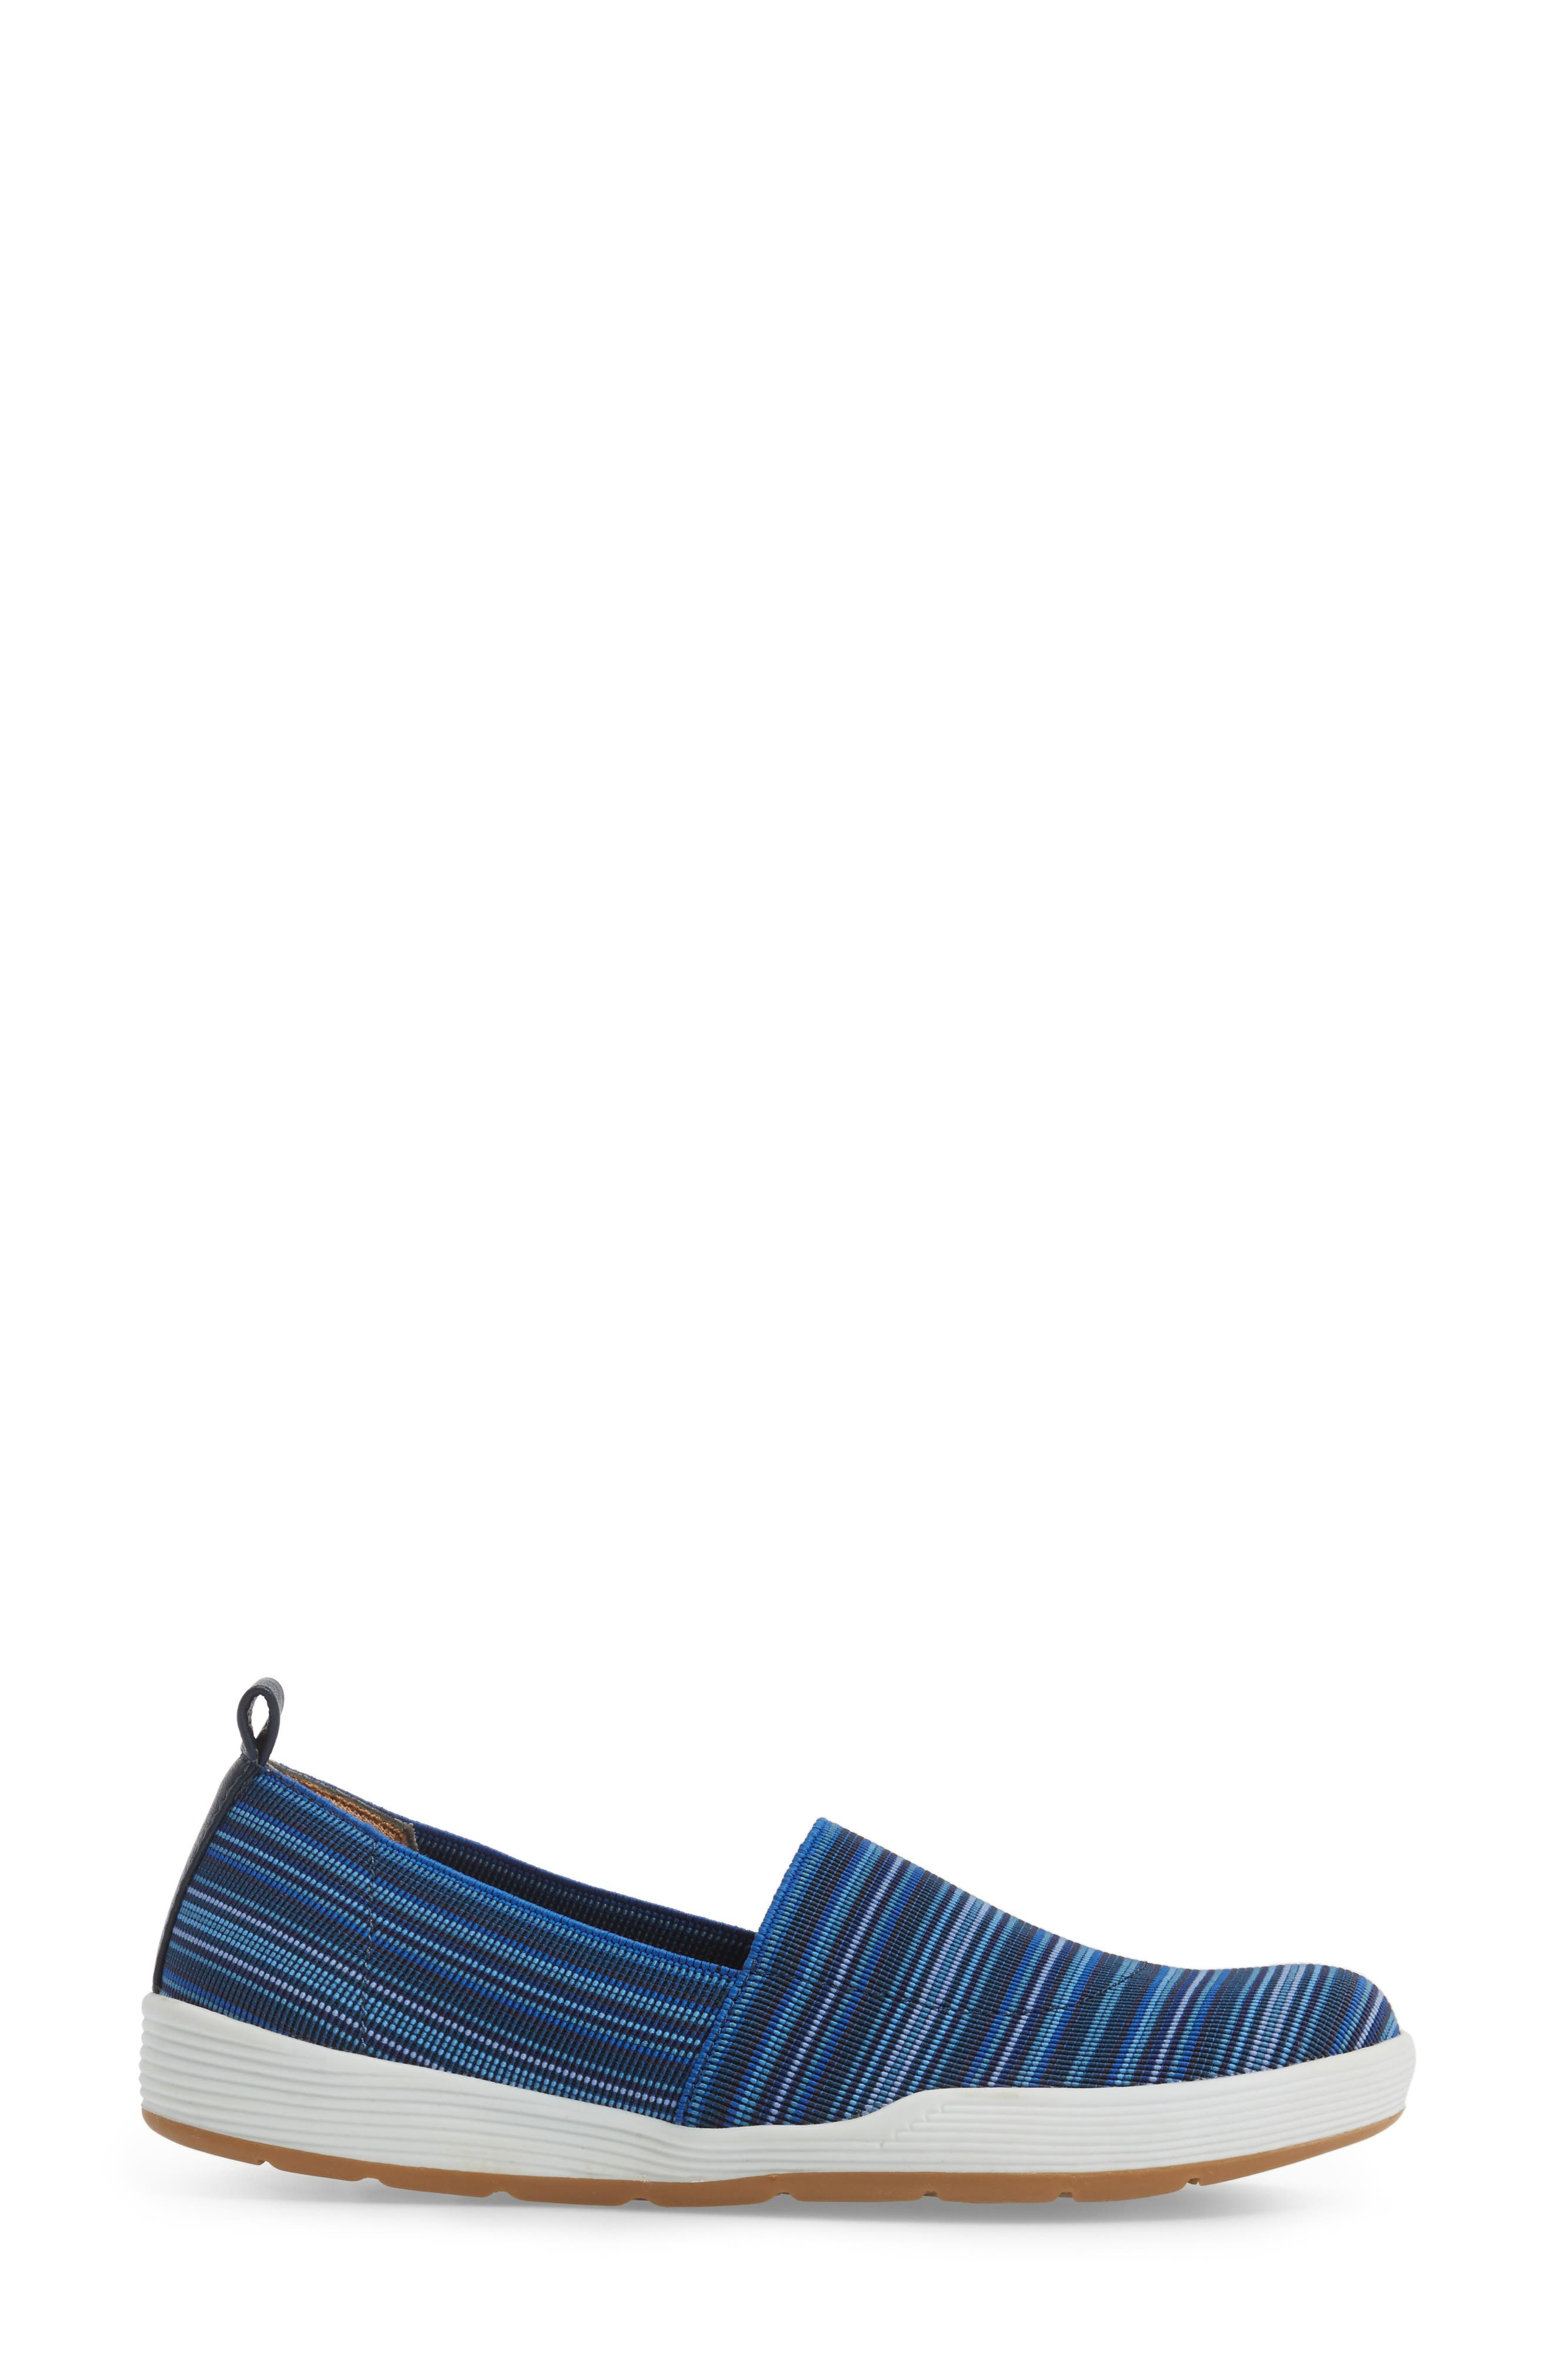 Lida Slip-On Flat,                             Alternate thumbnail 3, color,                             Blue Fabric